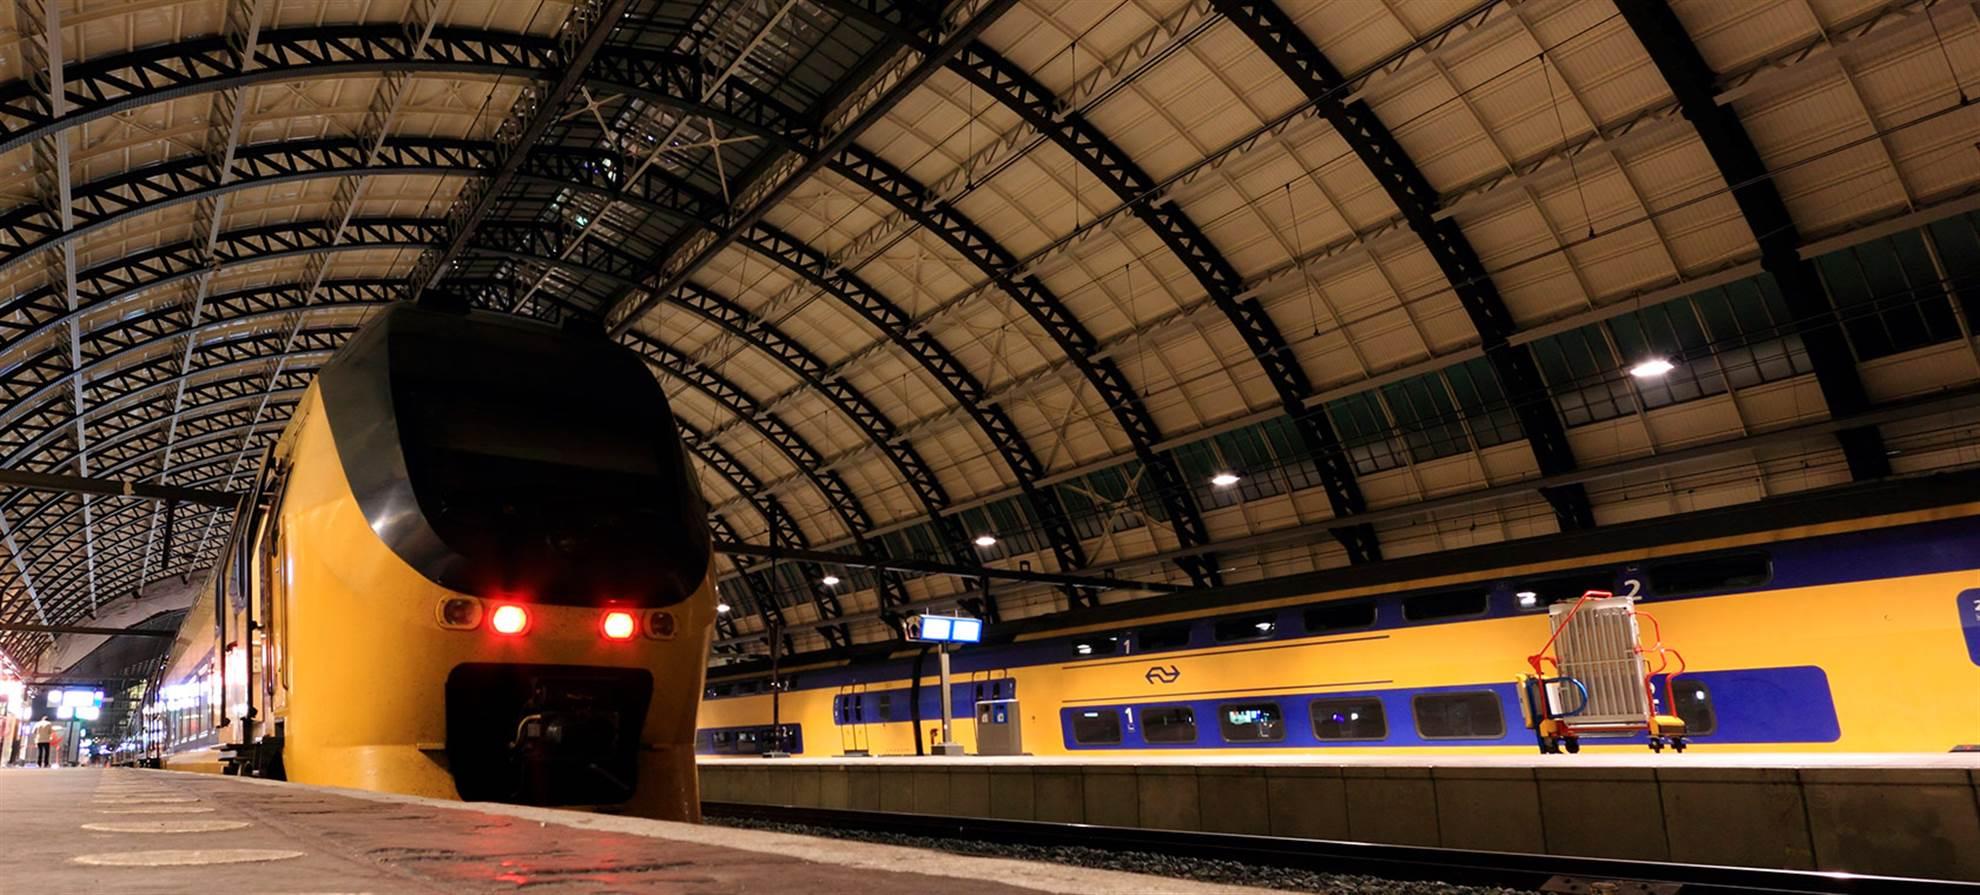 Tren desde Schiphol a Amsterdam